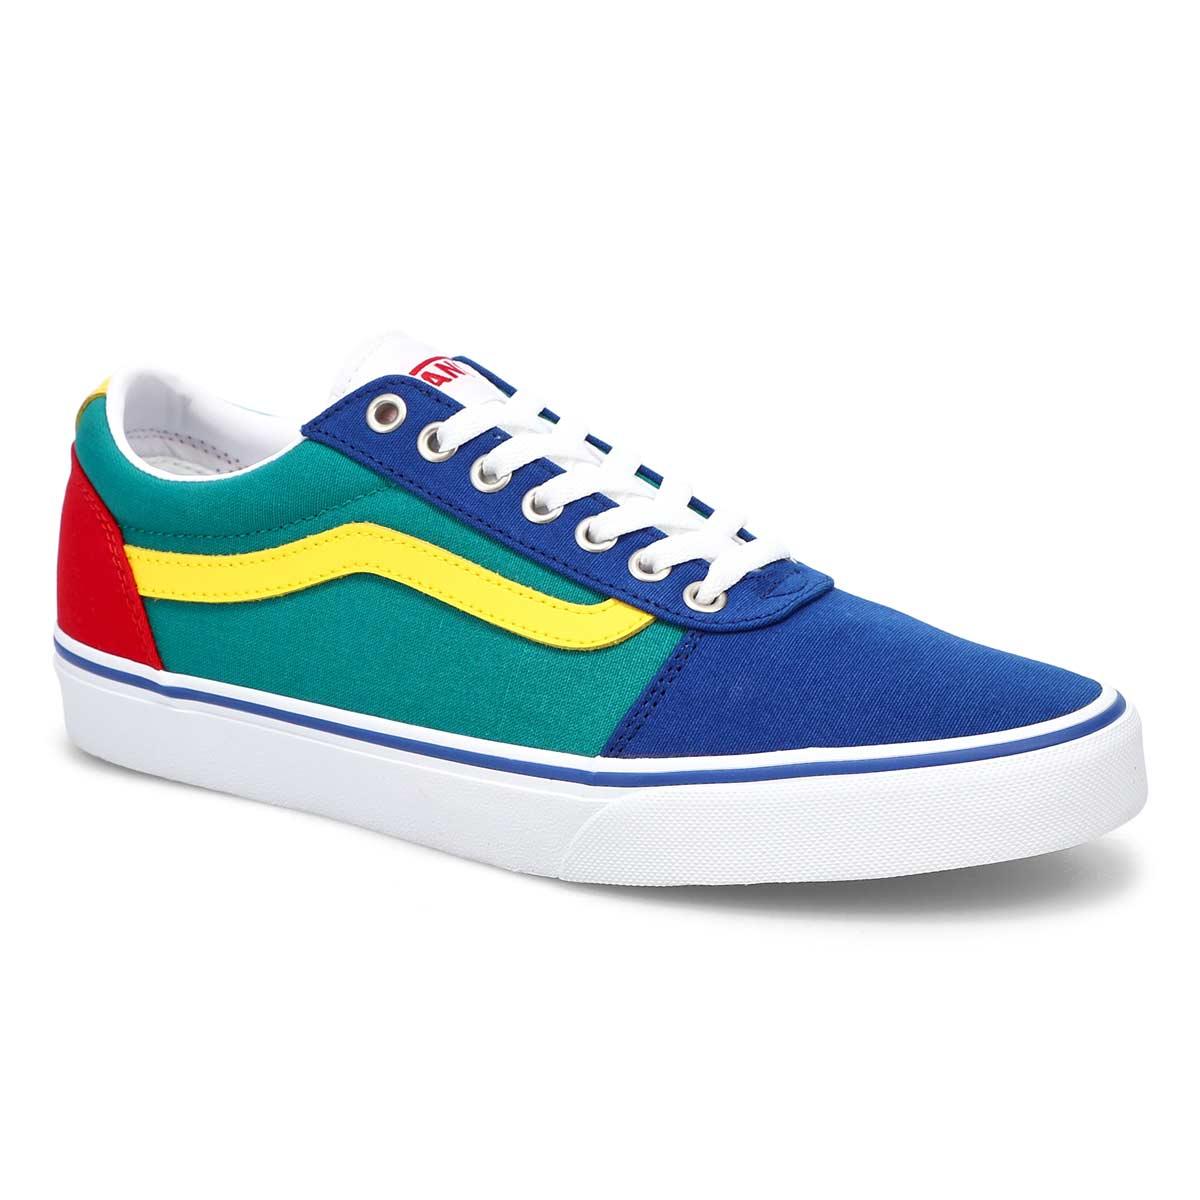 Men's Ward Sneaker - Blue/Red/Parasailing